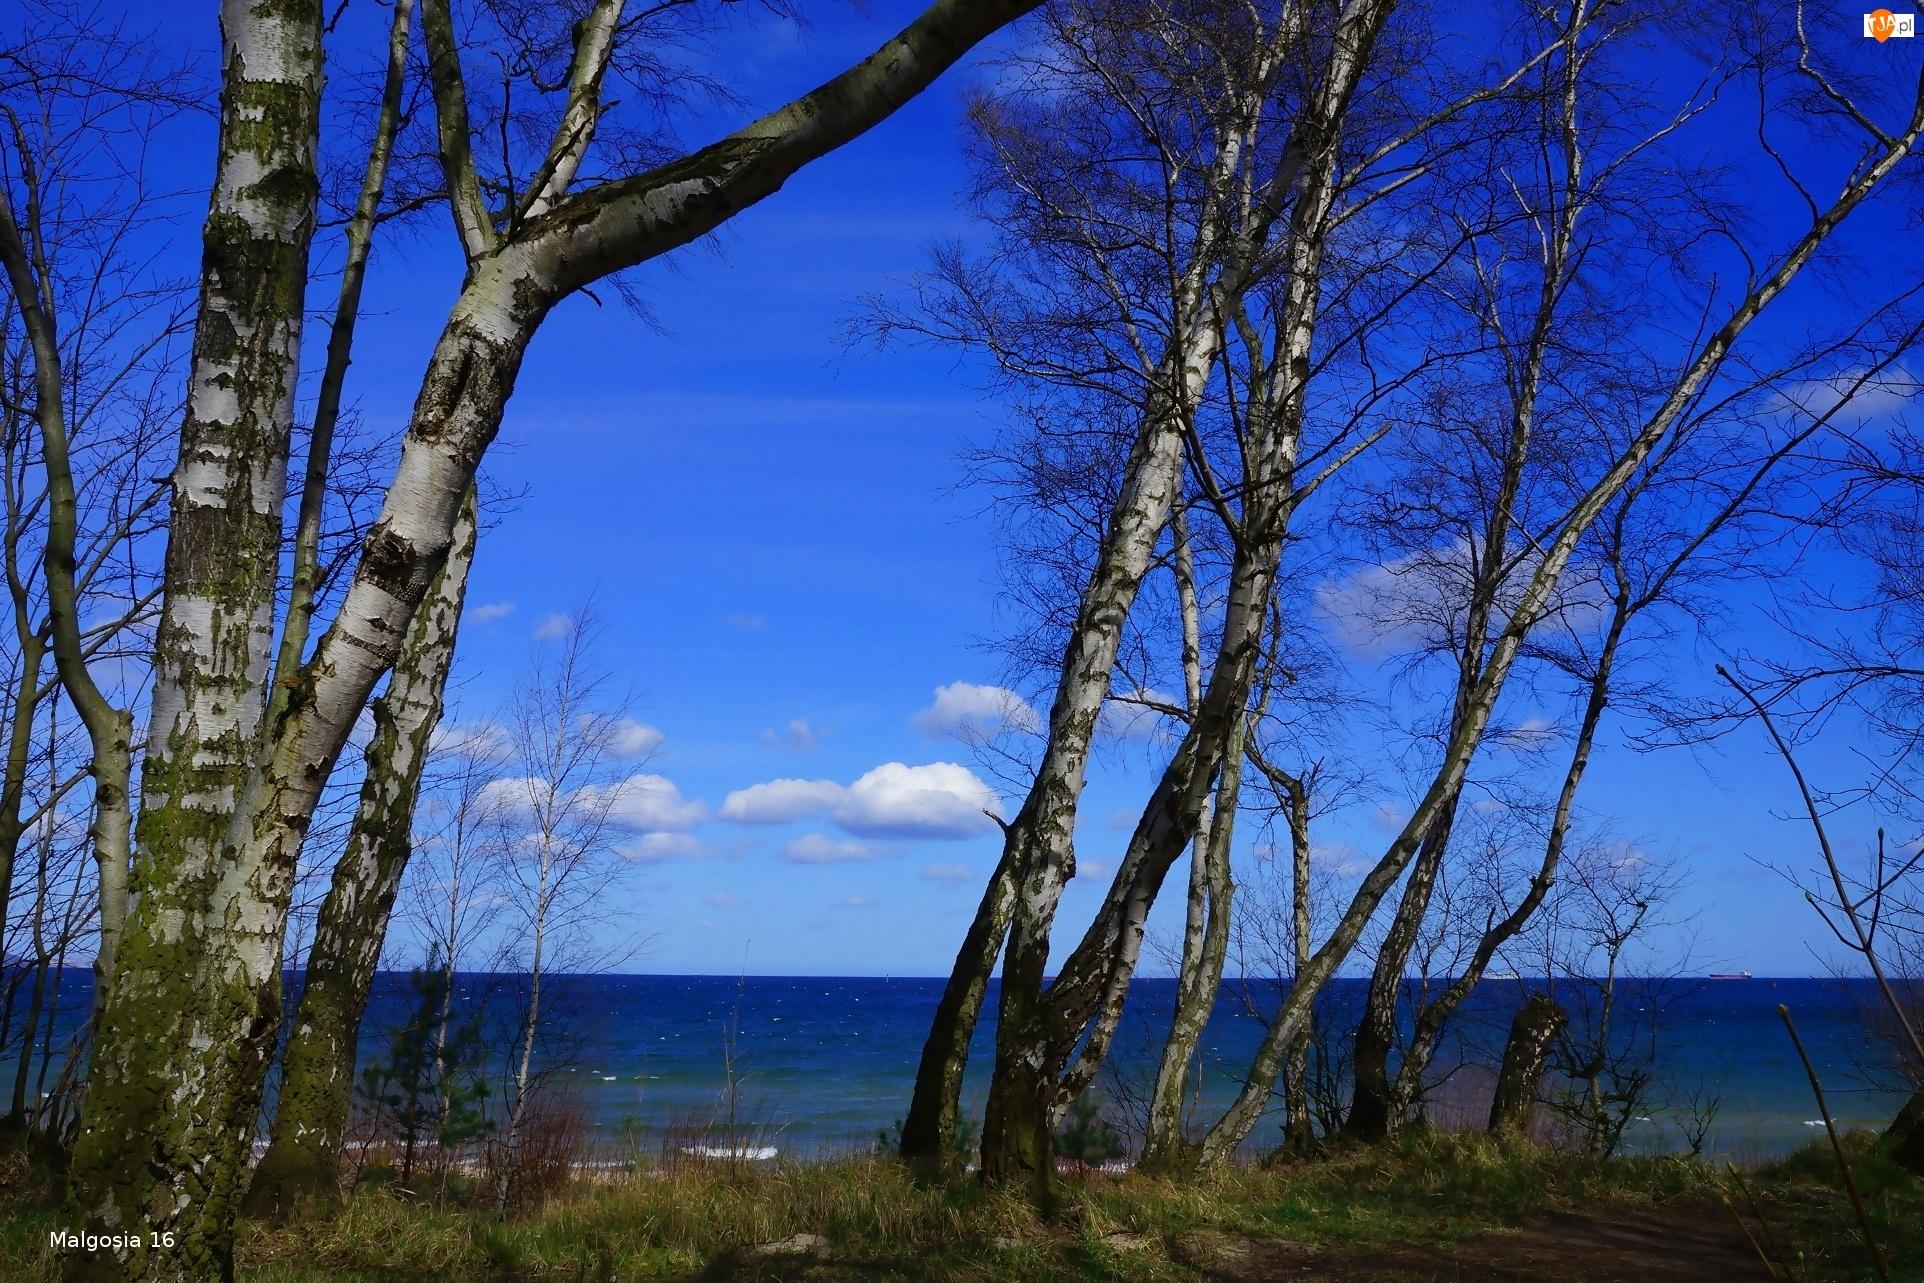 Morze, Drzewa, Brzoza